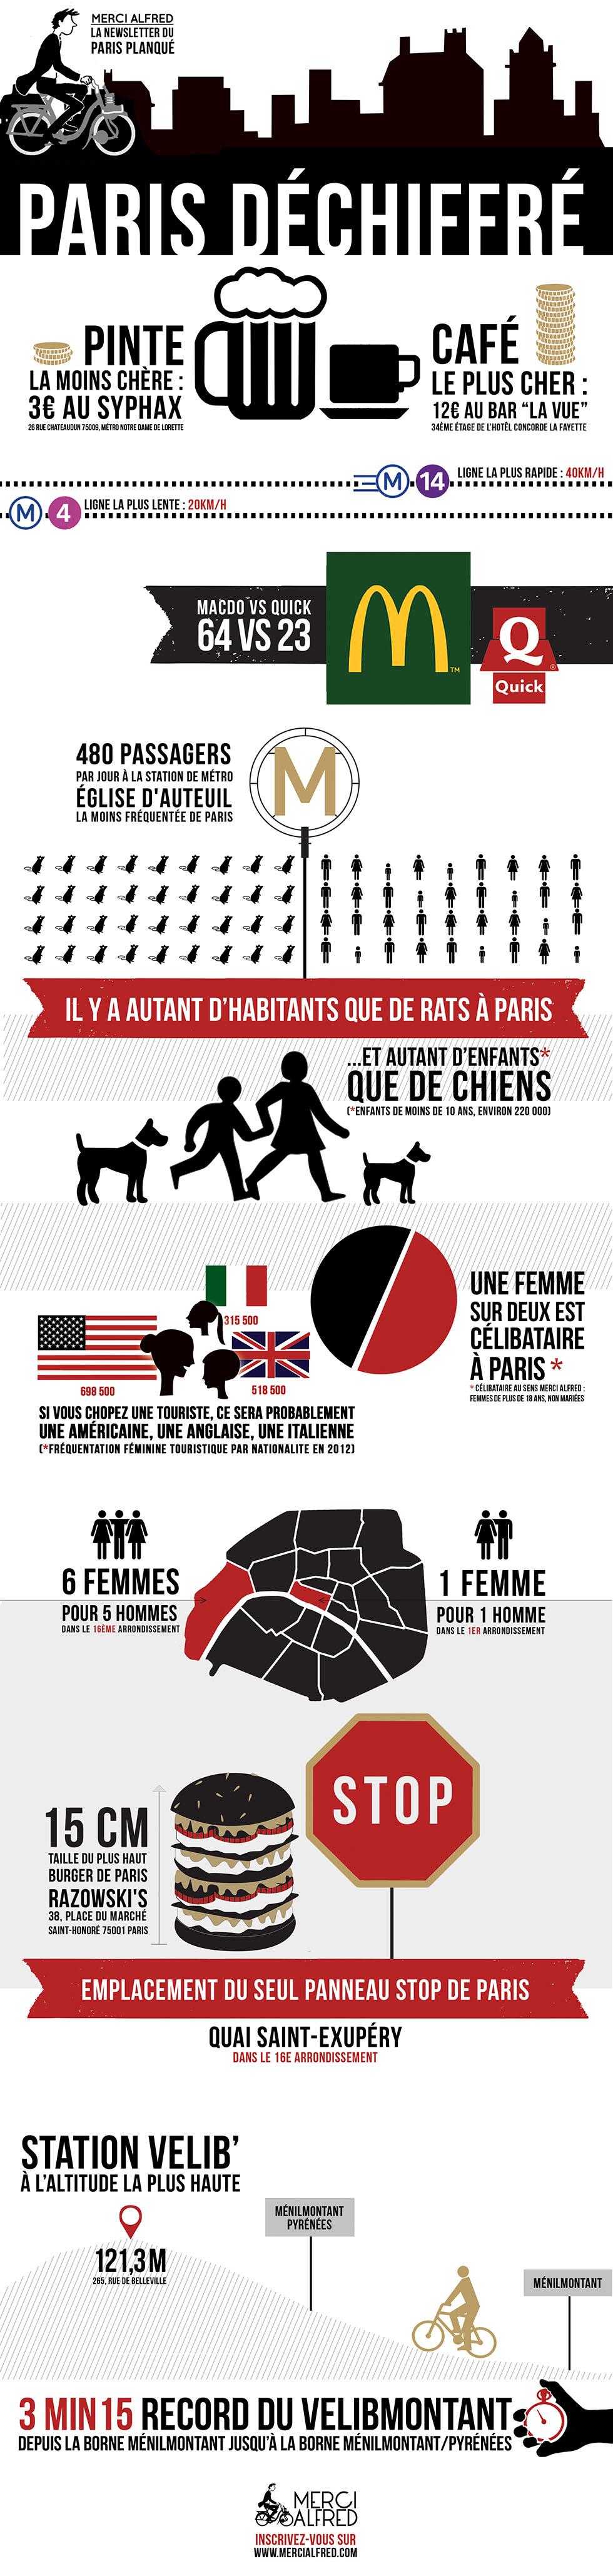 Infographie Paris